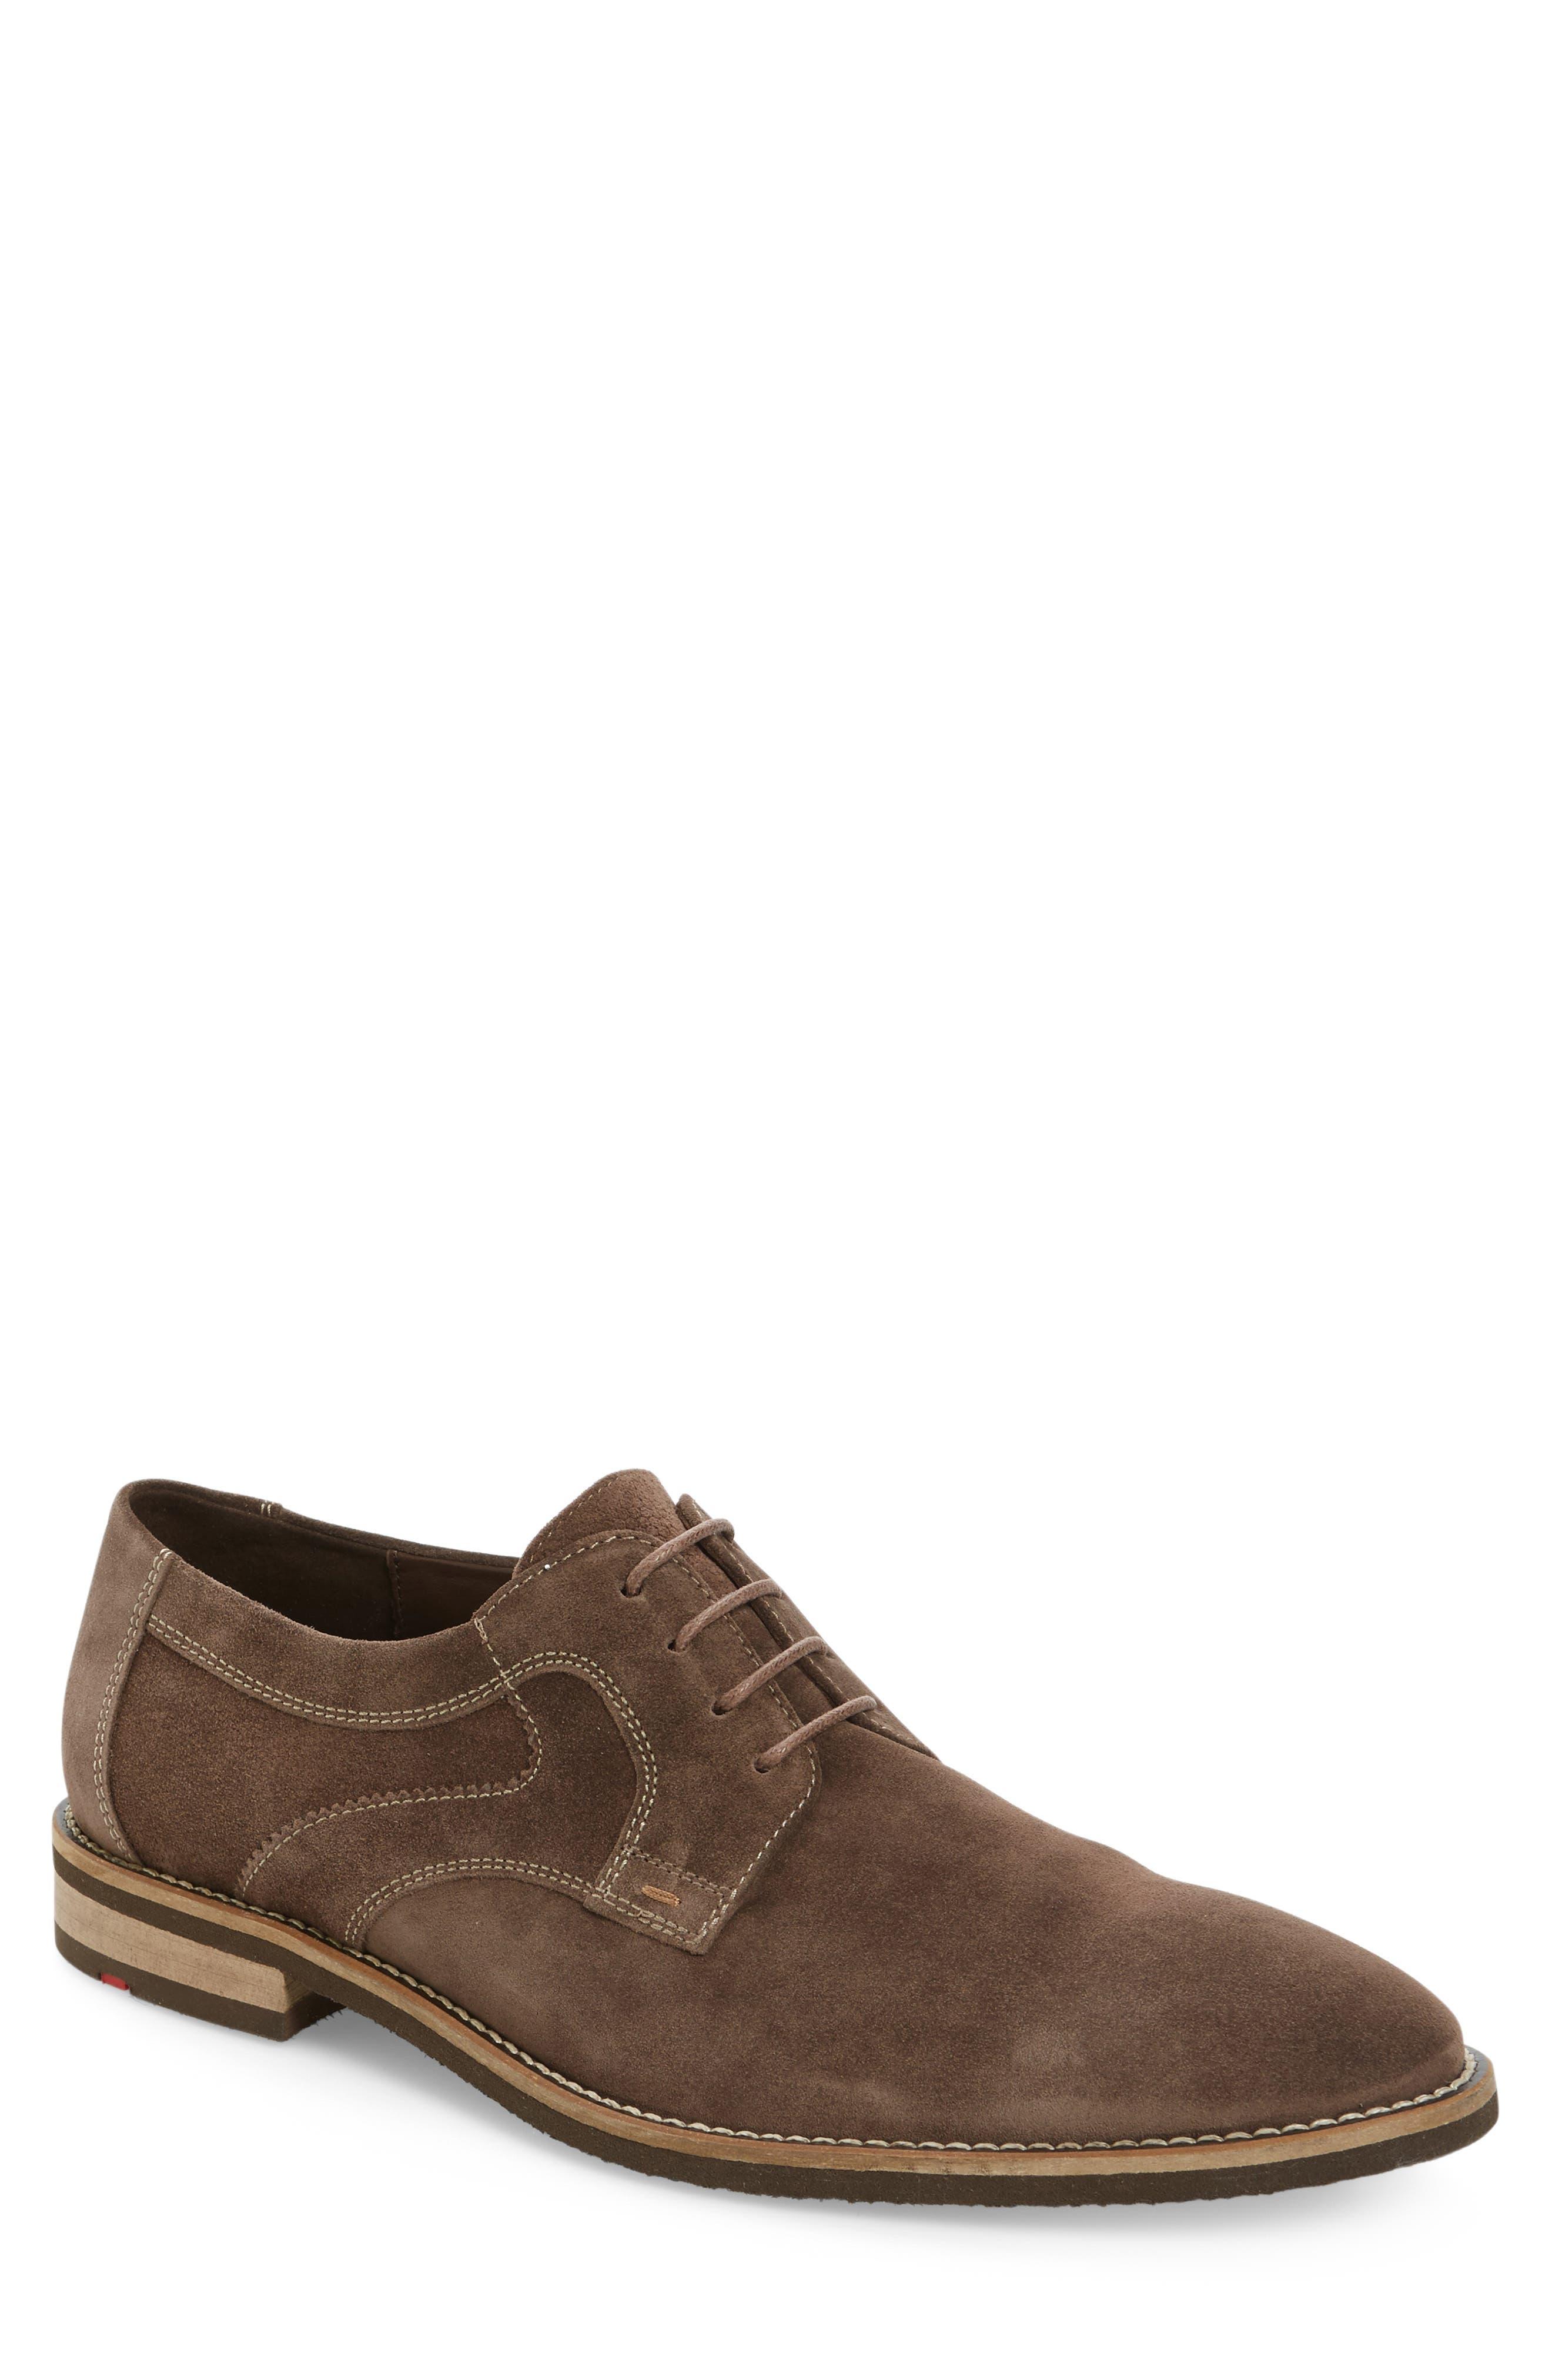 Main Image - Lloyd Haarlem Buck Shoe (Men)